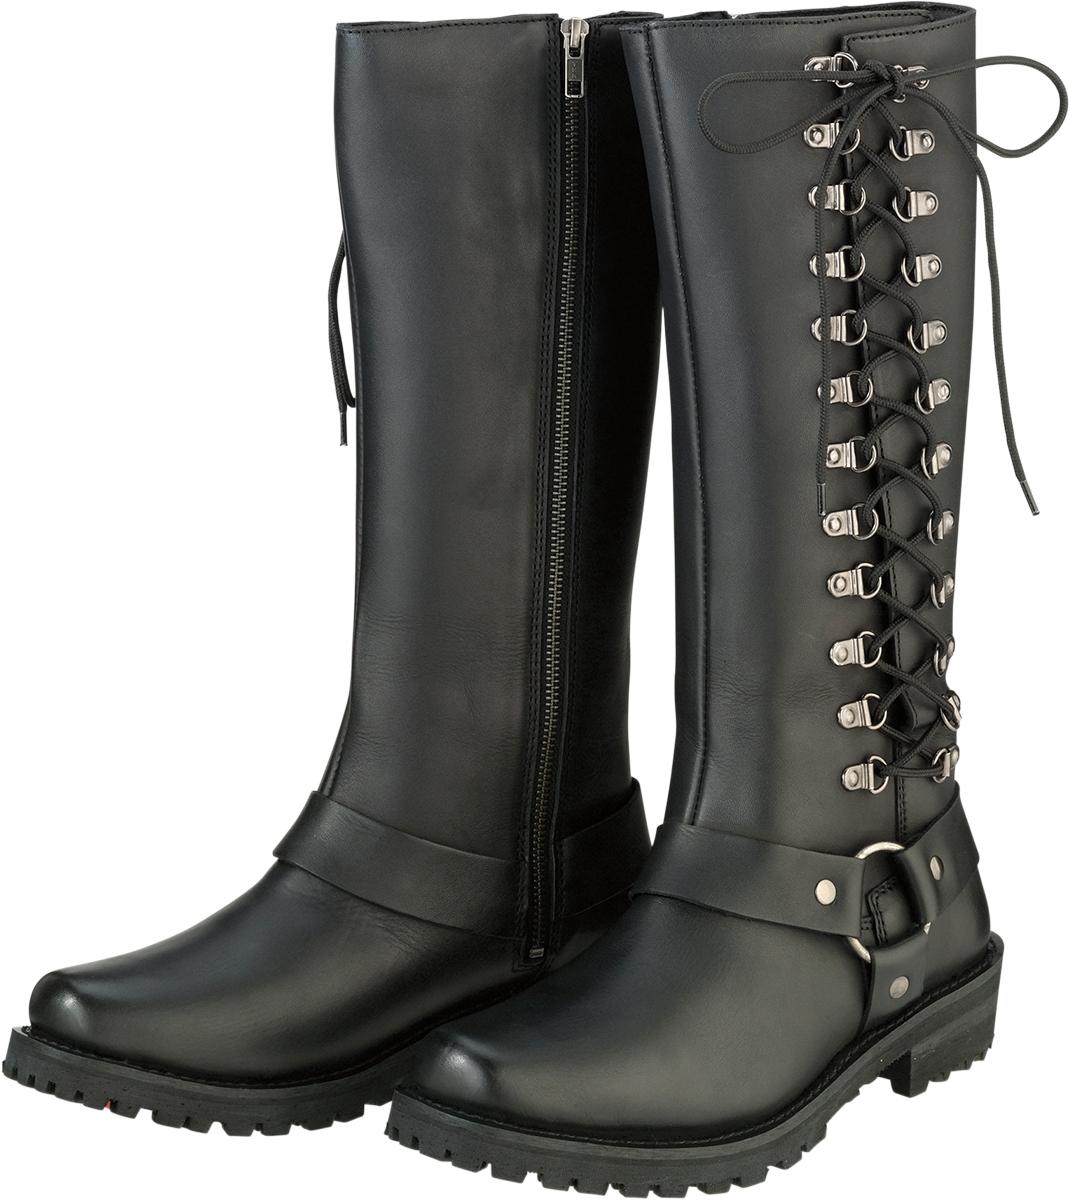 Z1R Savage Women's Boot